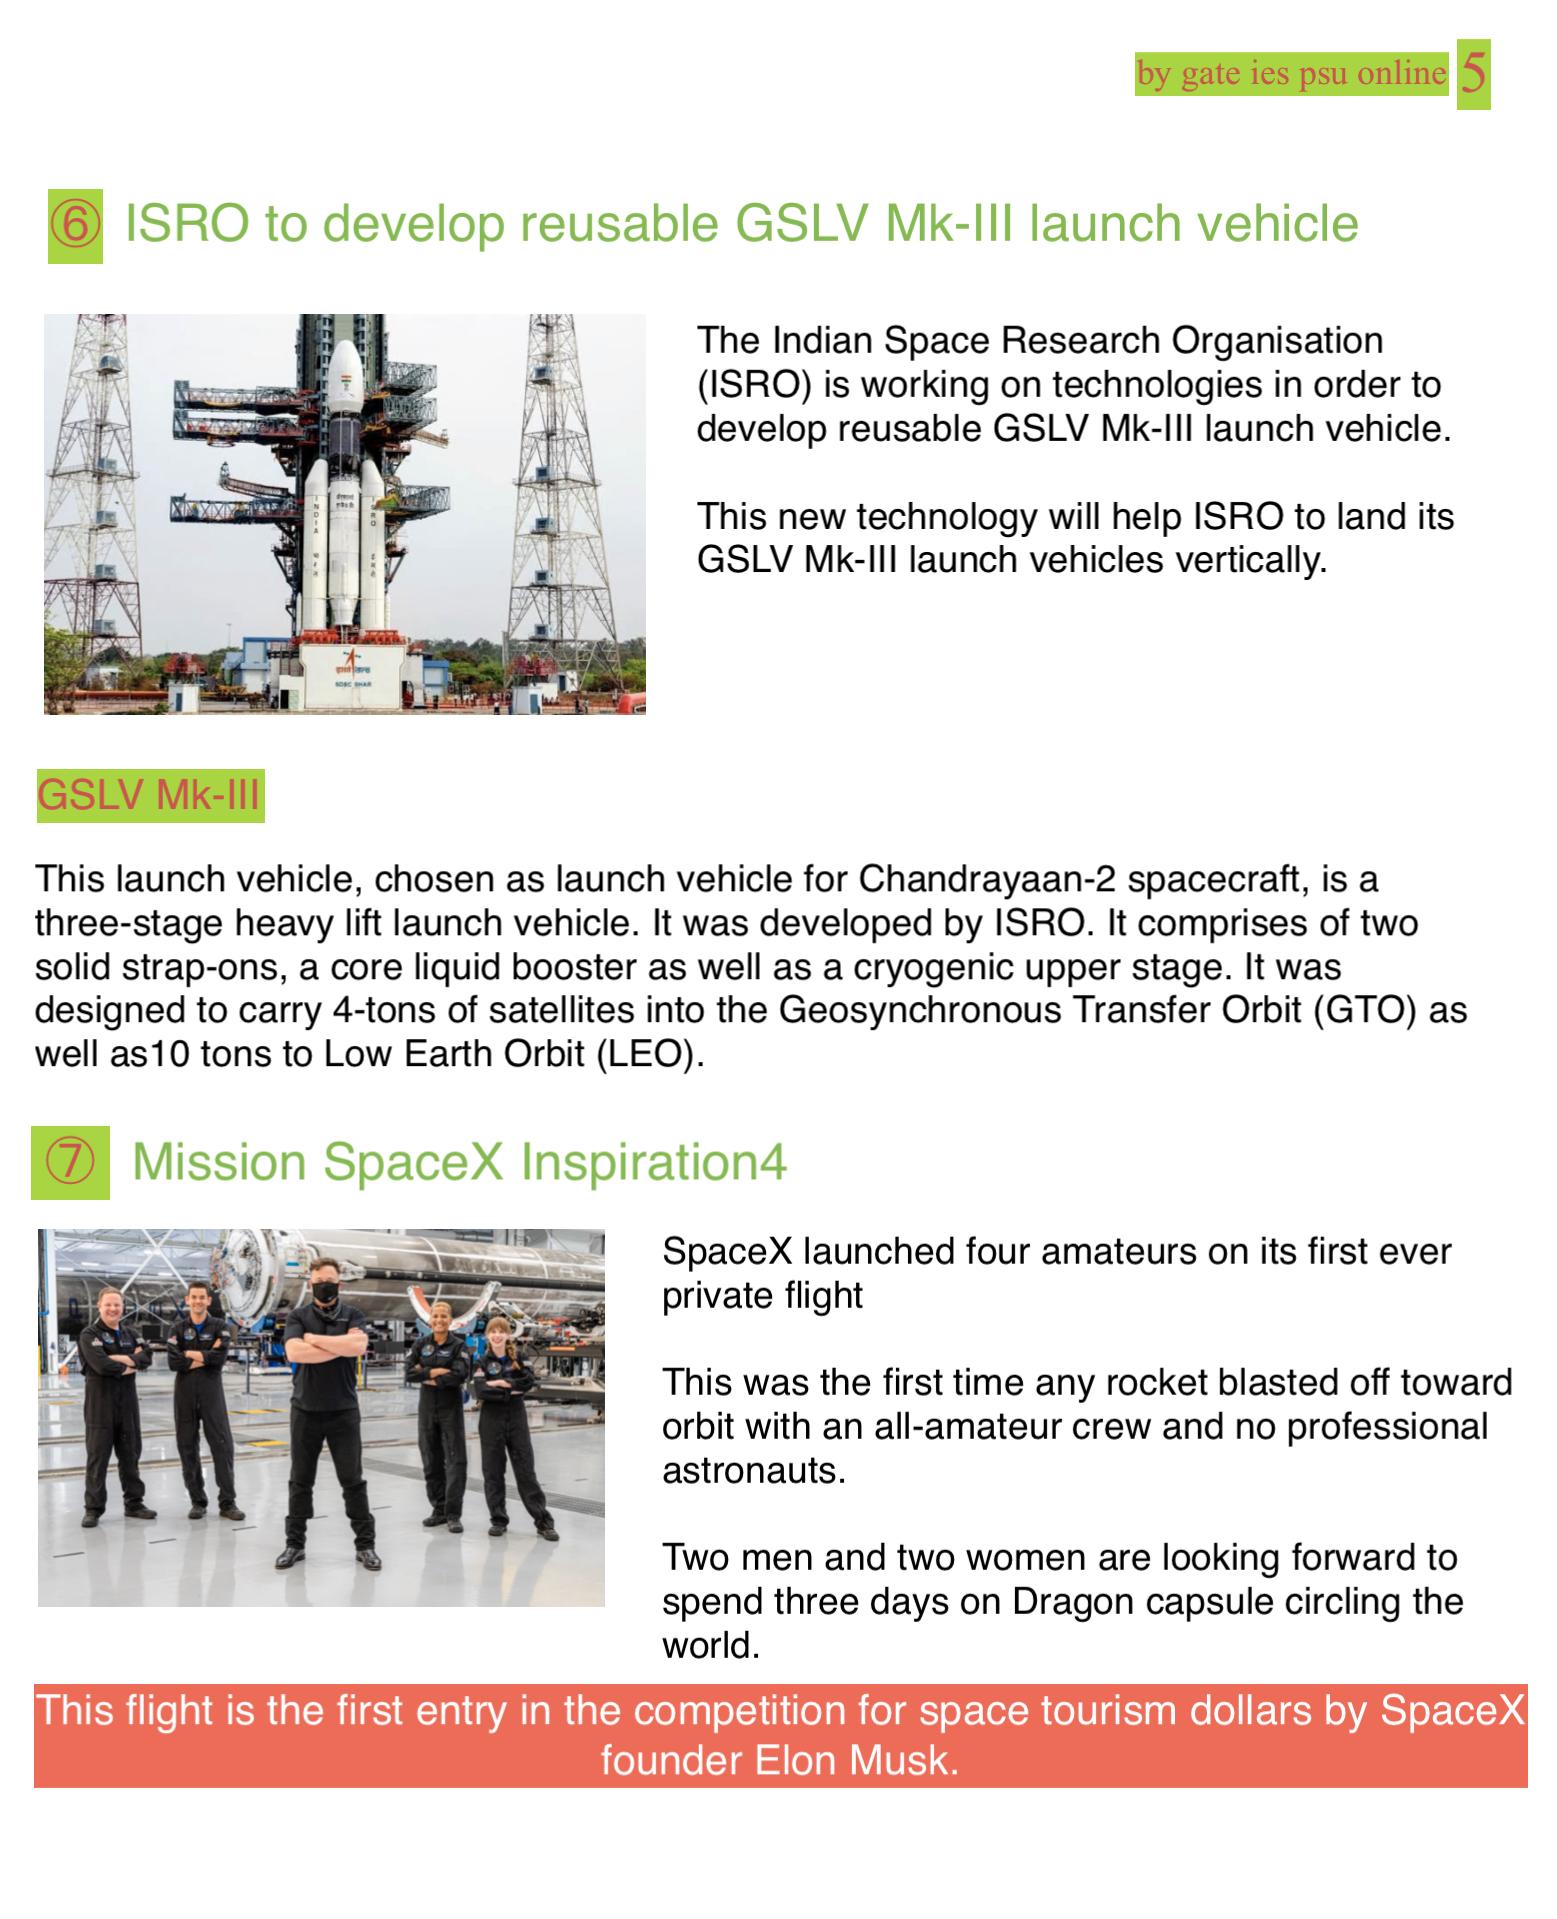 ISRO GSLV MK 3 reusable launch vehicle UPSC IES CURRENT AFFAIRS